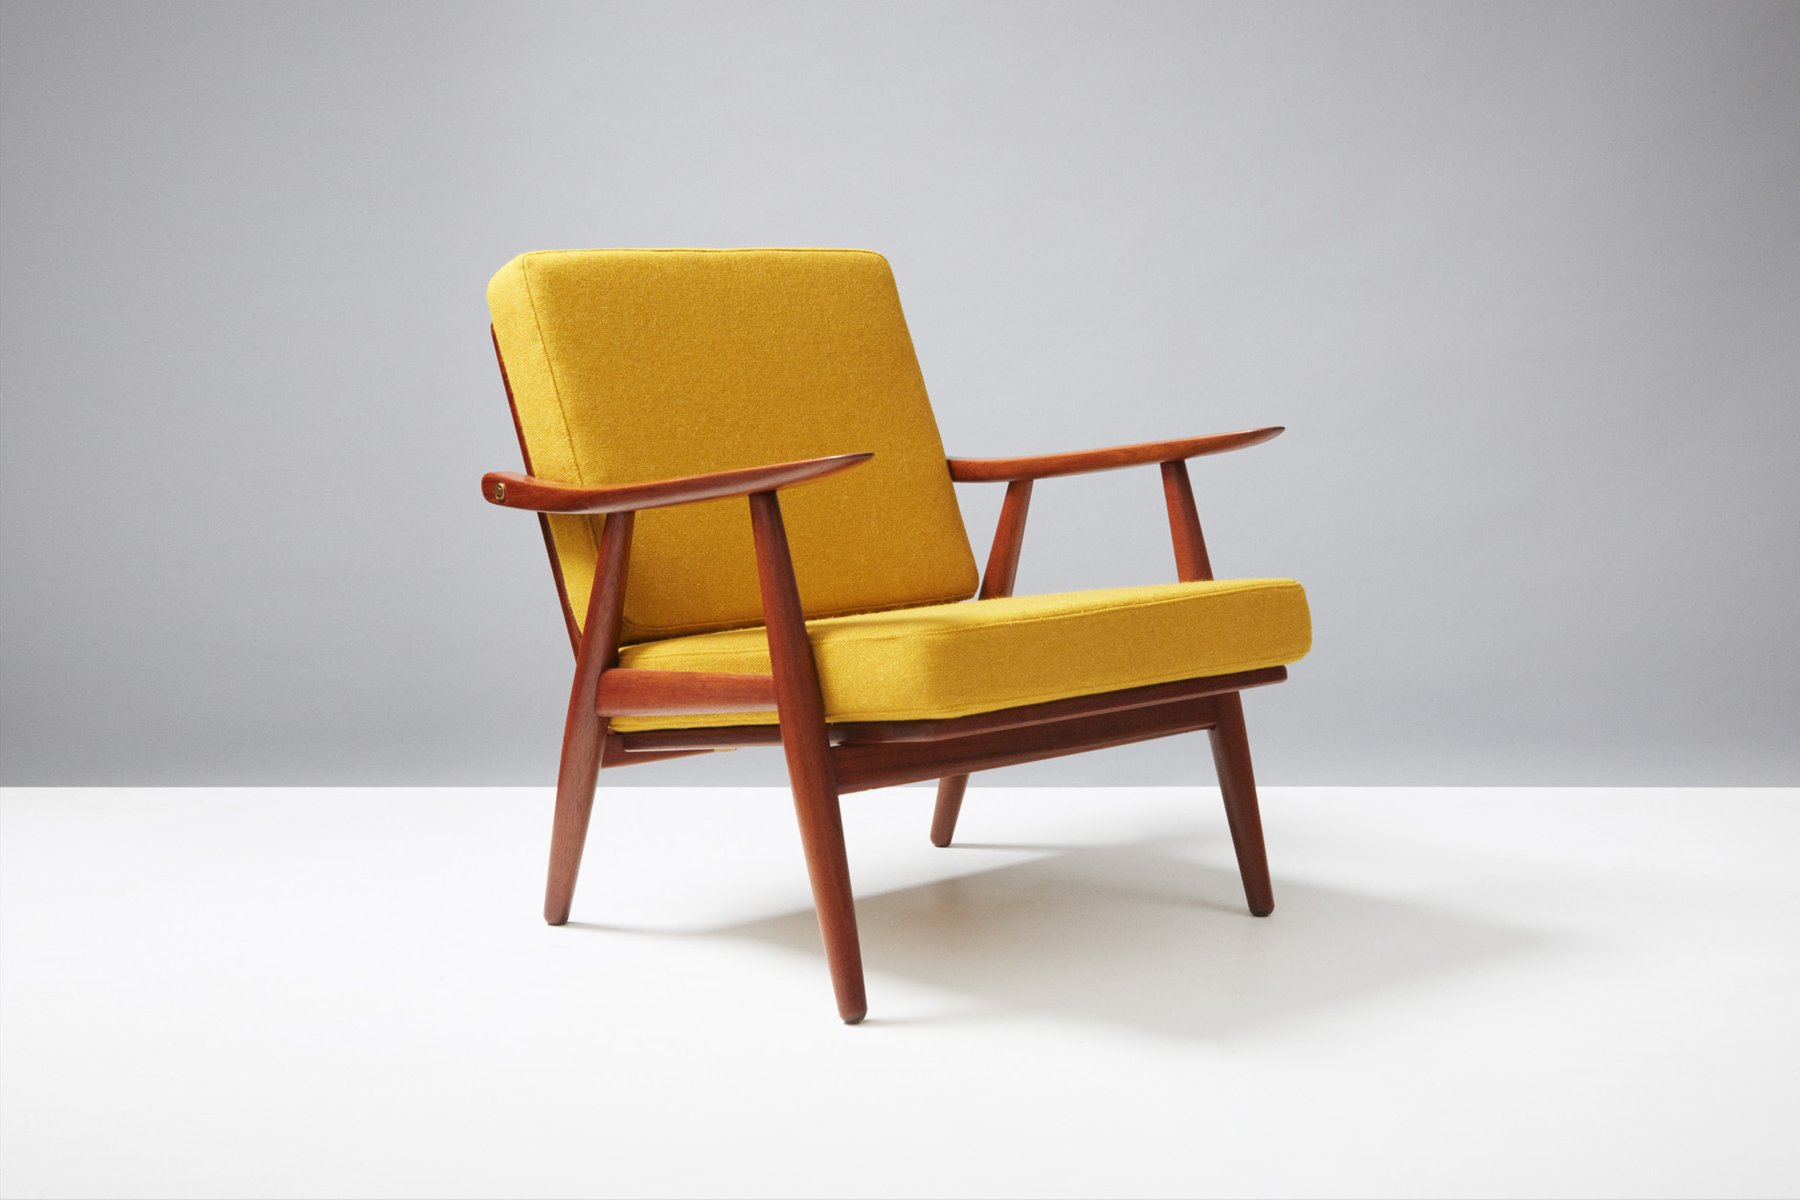 Ge 270 teak lounge chair by hans wegner for getama 1950s for Hans wegner queen chair